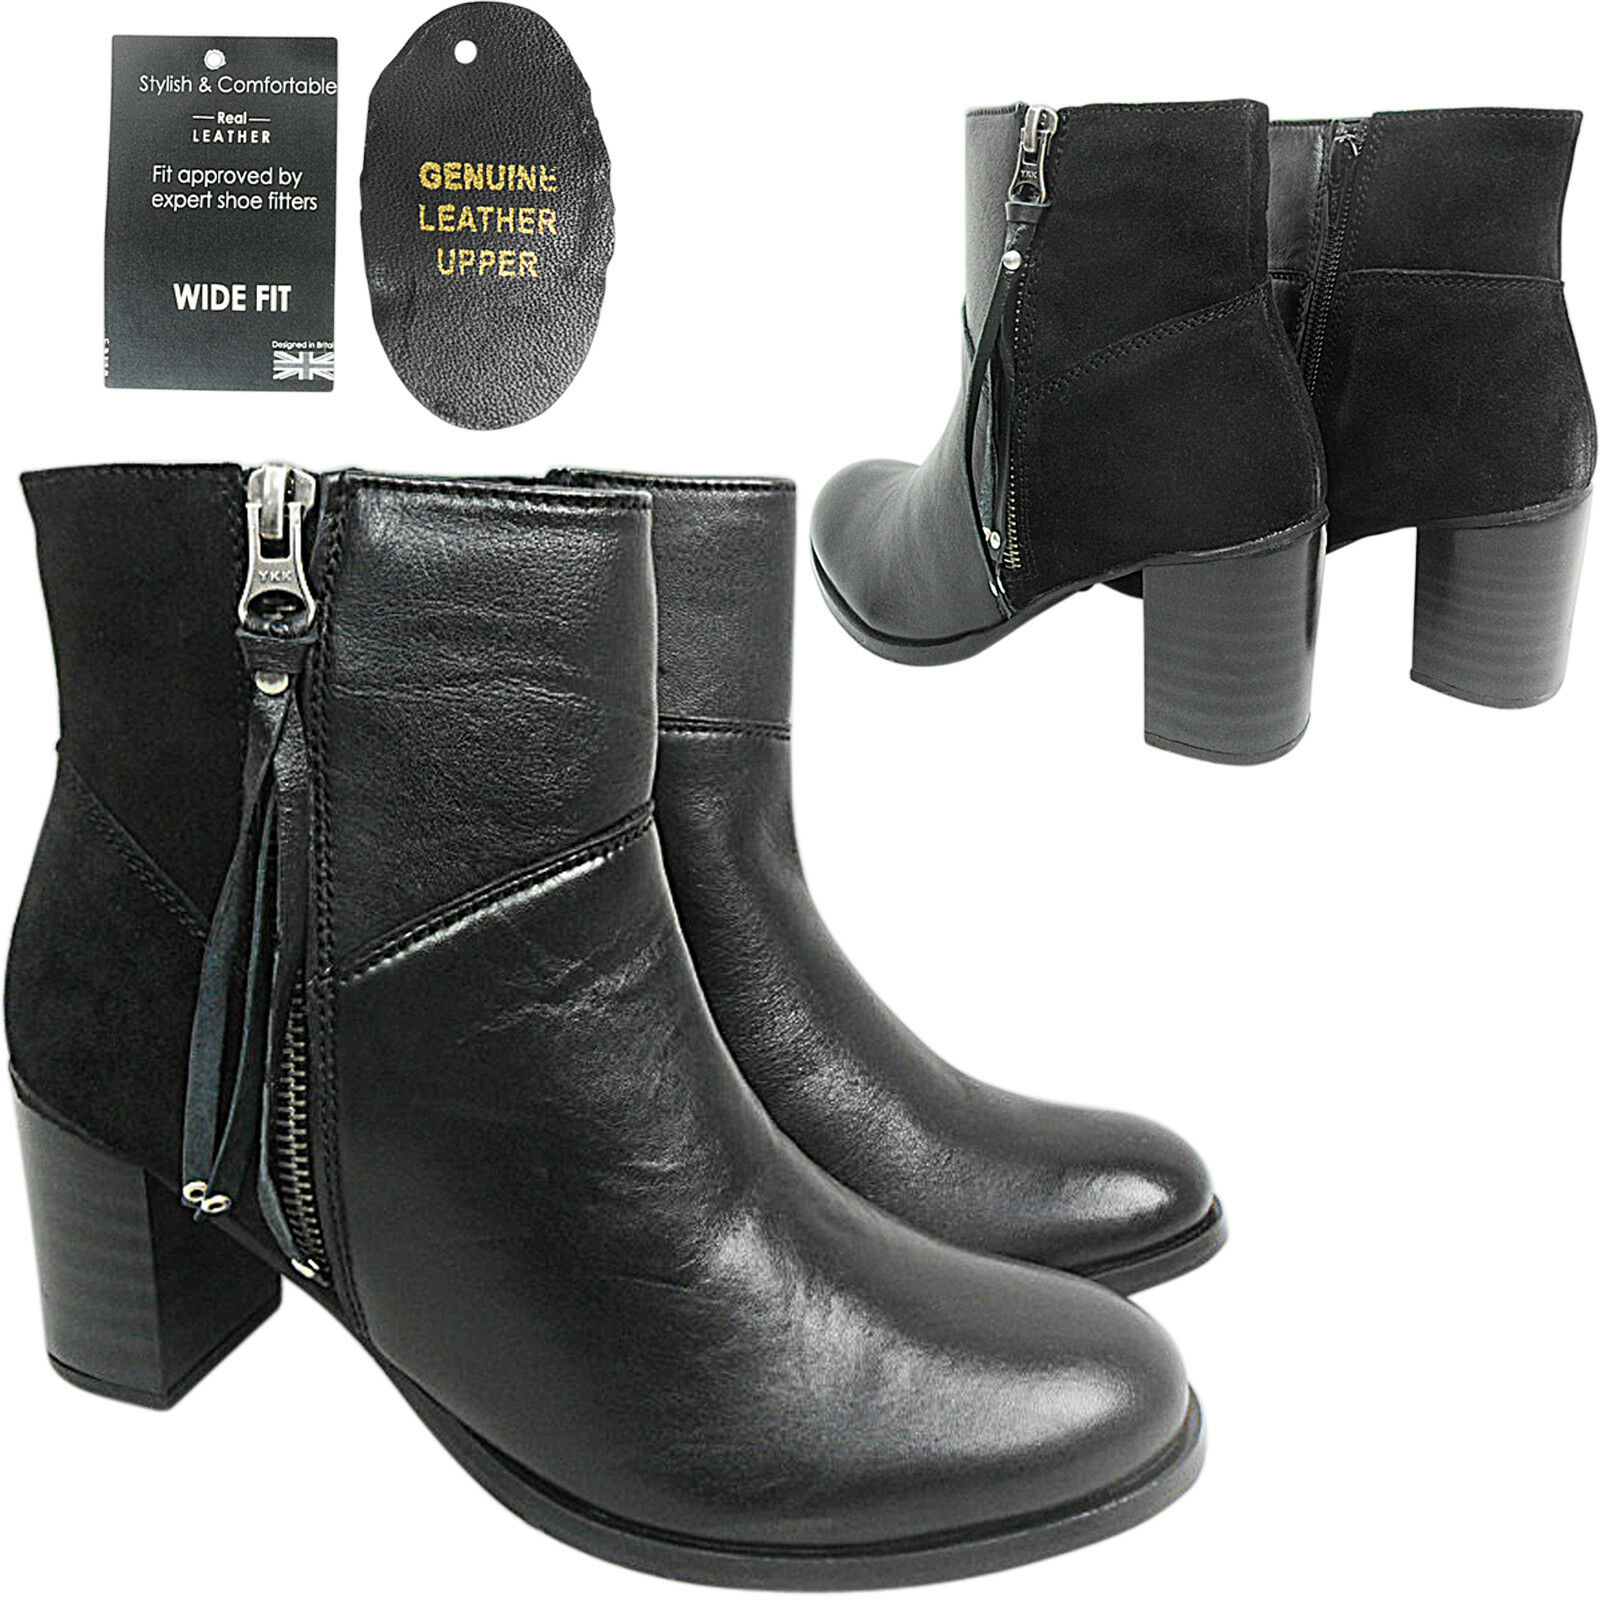 WIDE E Ladies Women Mid Block Heel REAL LEATHER Zip Ankle Boot Shoe Size Comfort